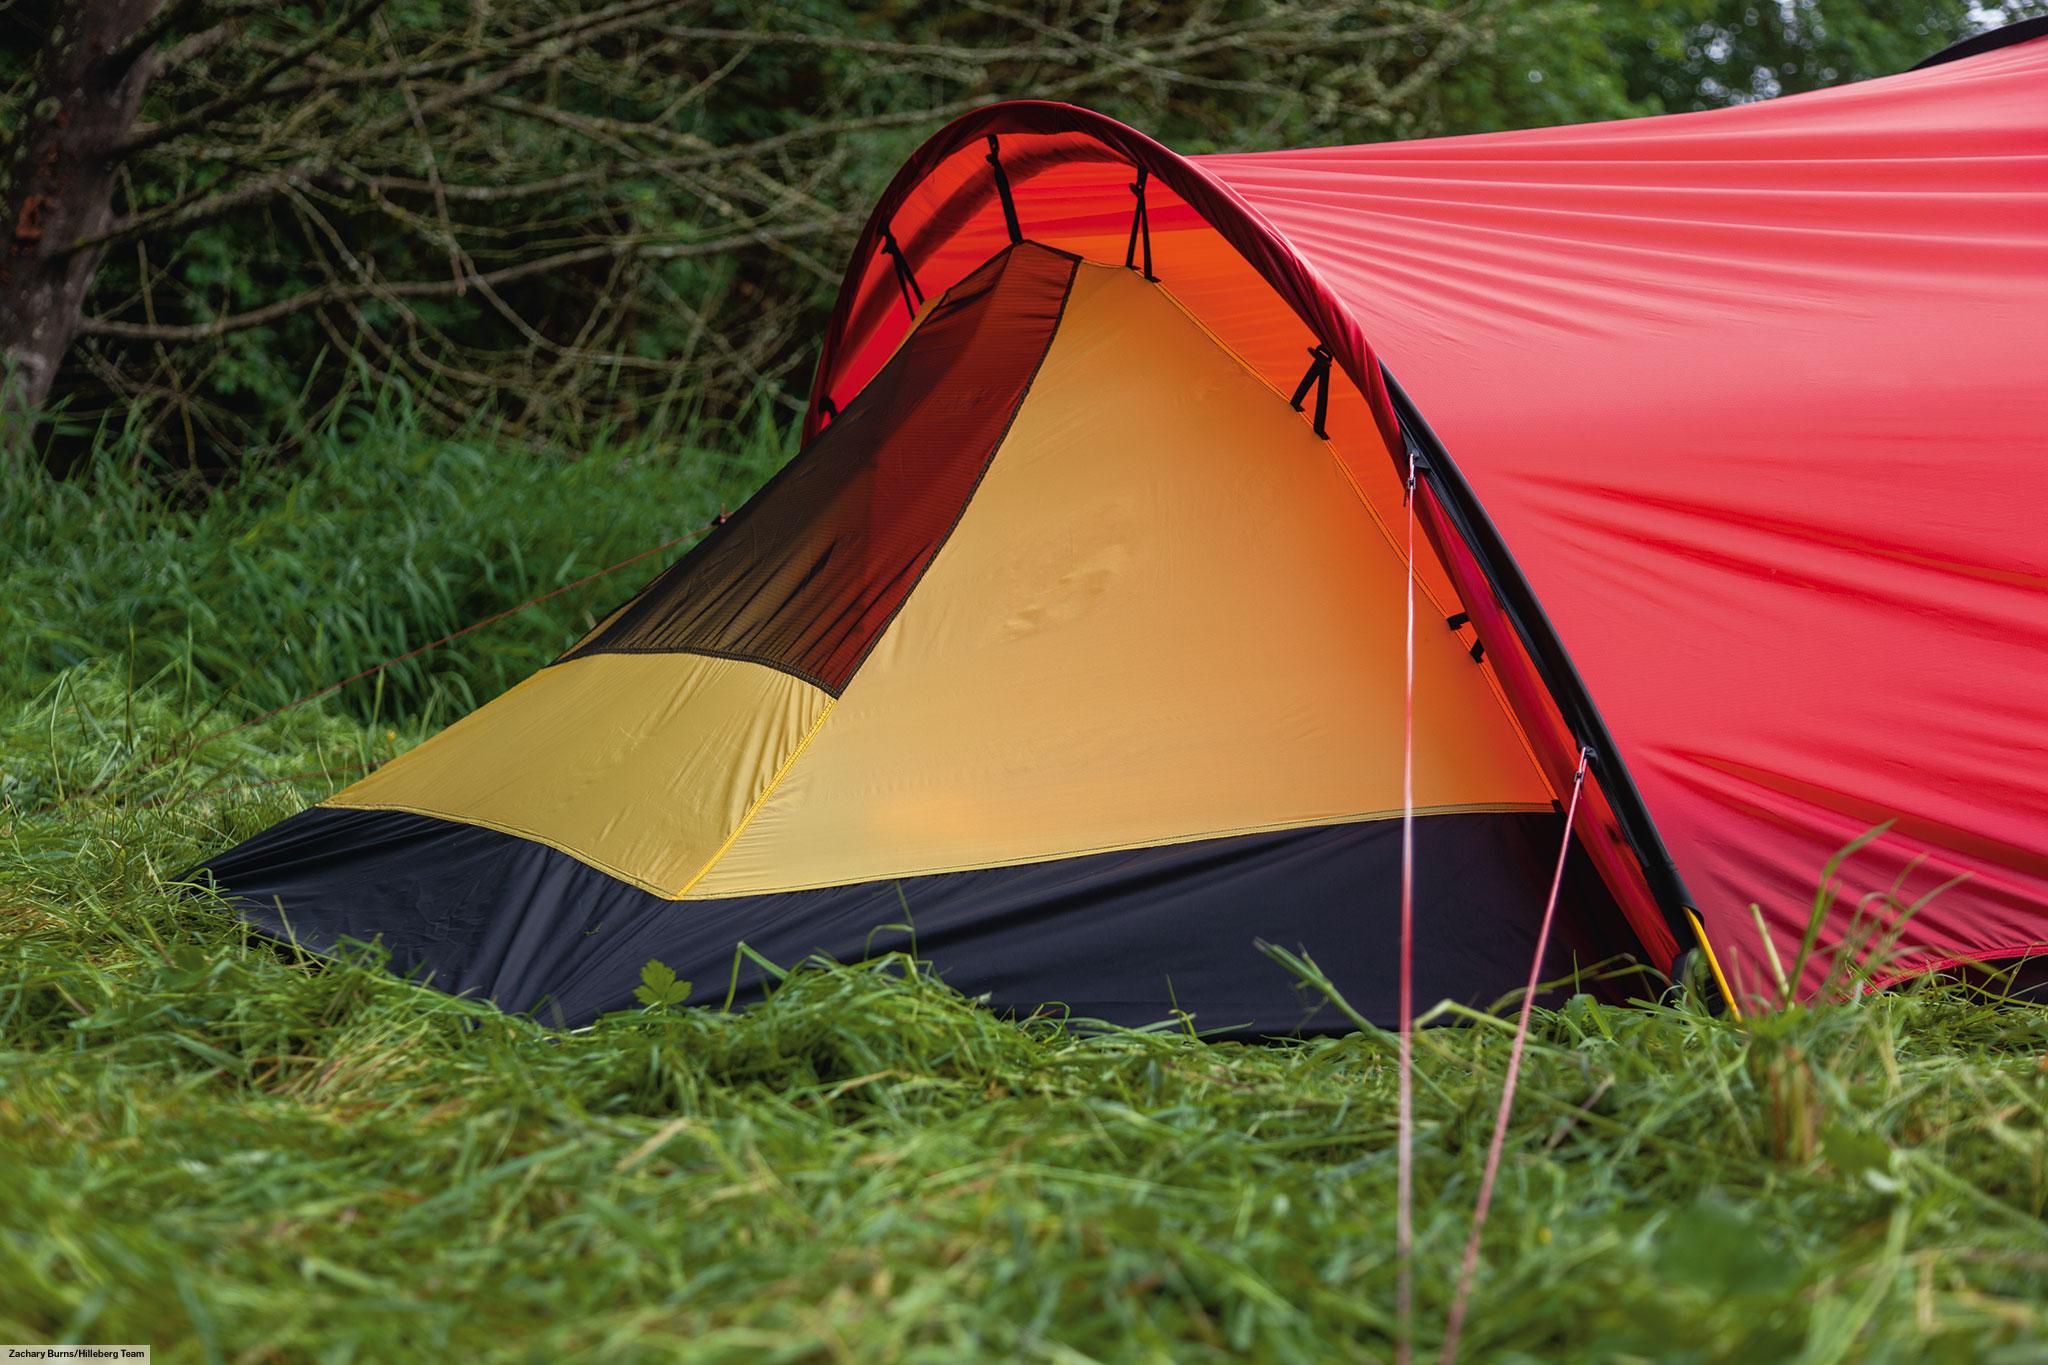 Anjan 2 $690 & Anjan 2 u2022 2 person tent u2022 Hilleberg